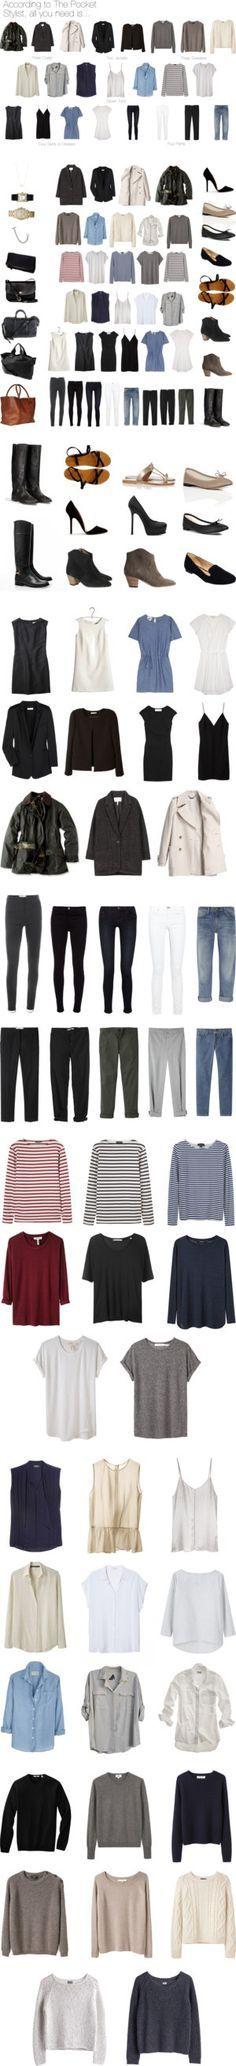 Capsule wardrobes by keelyhenesey liked on polyvore for Minimalistischer kleiderschrank